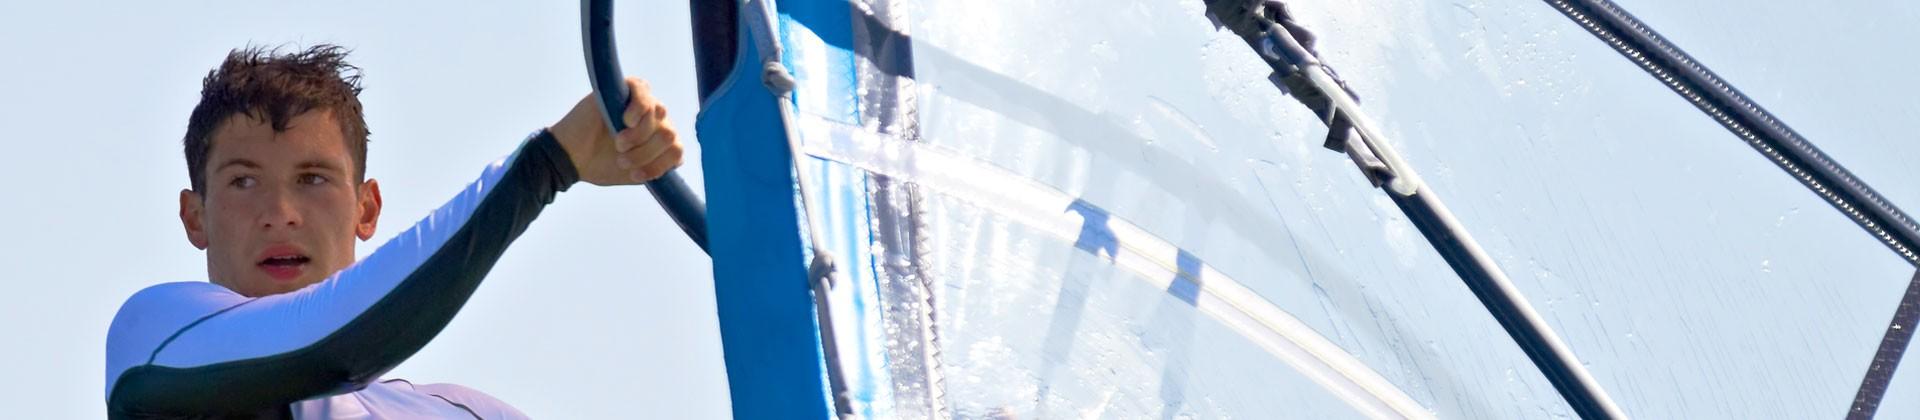 https://www.goodmorningtenerife.com/wp-content/uploads/2014/08/01_slide_windsurfing_GM_Tenerife-1920x420.jpg